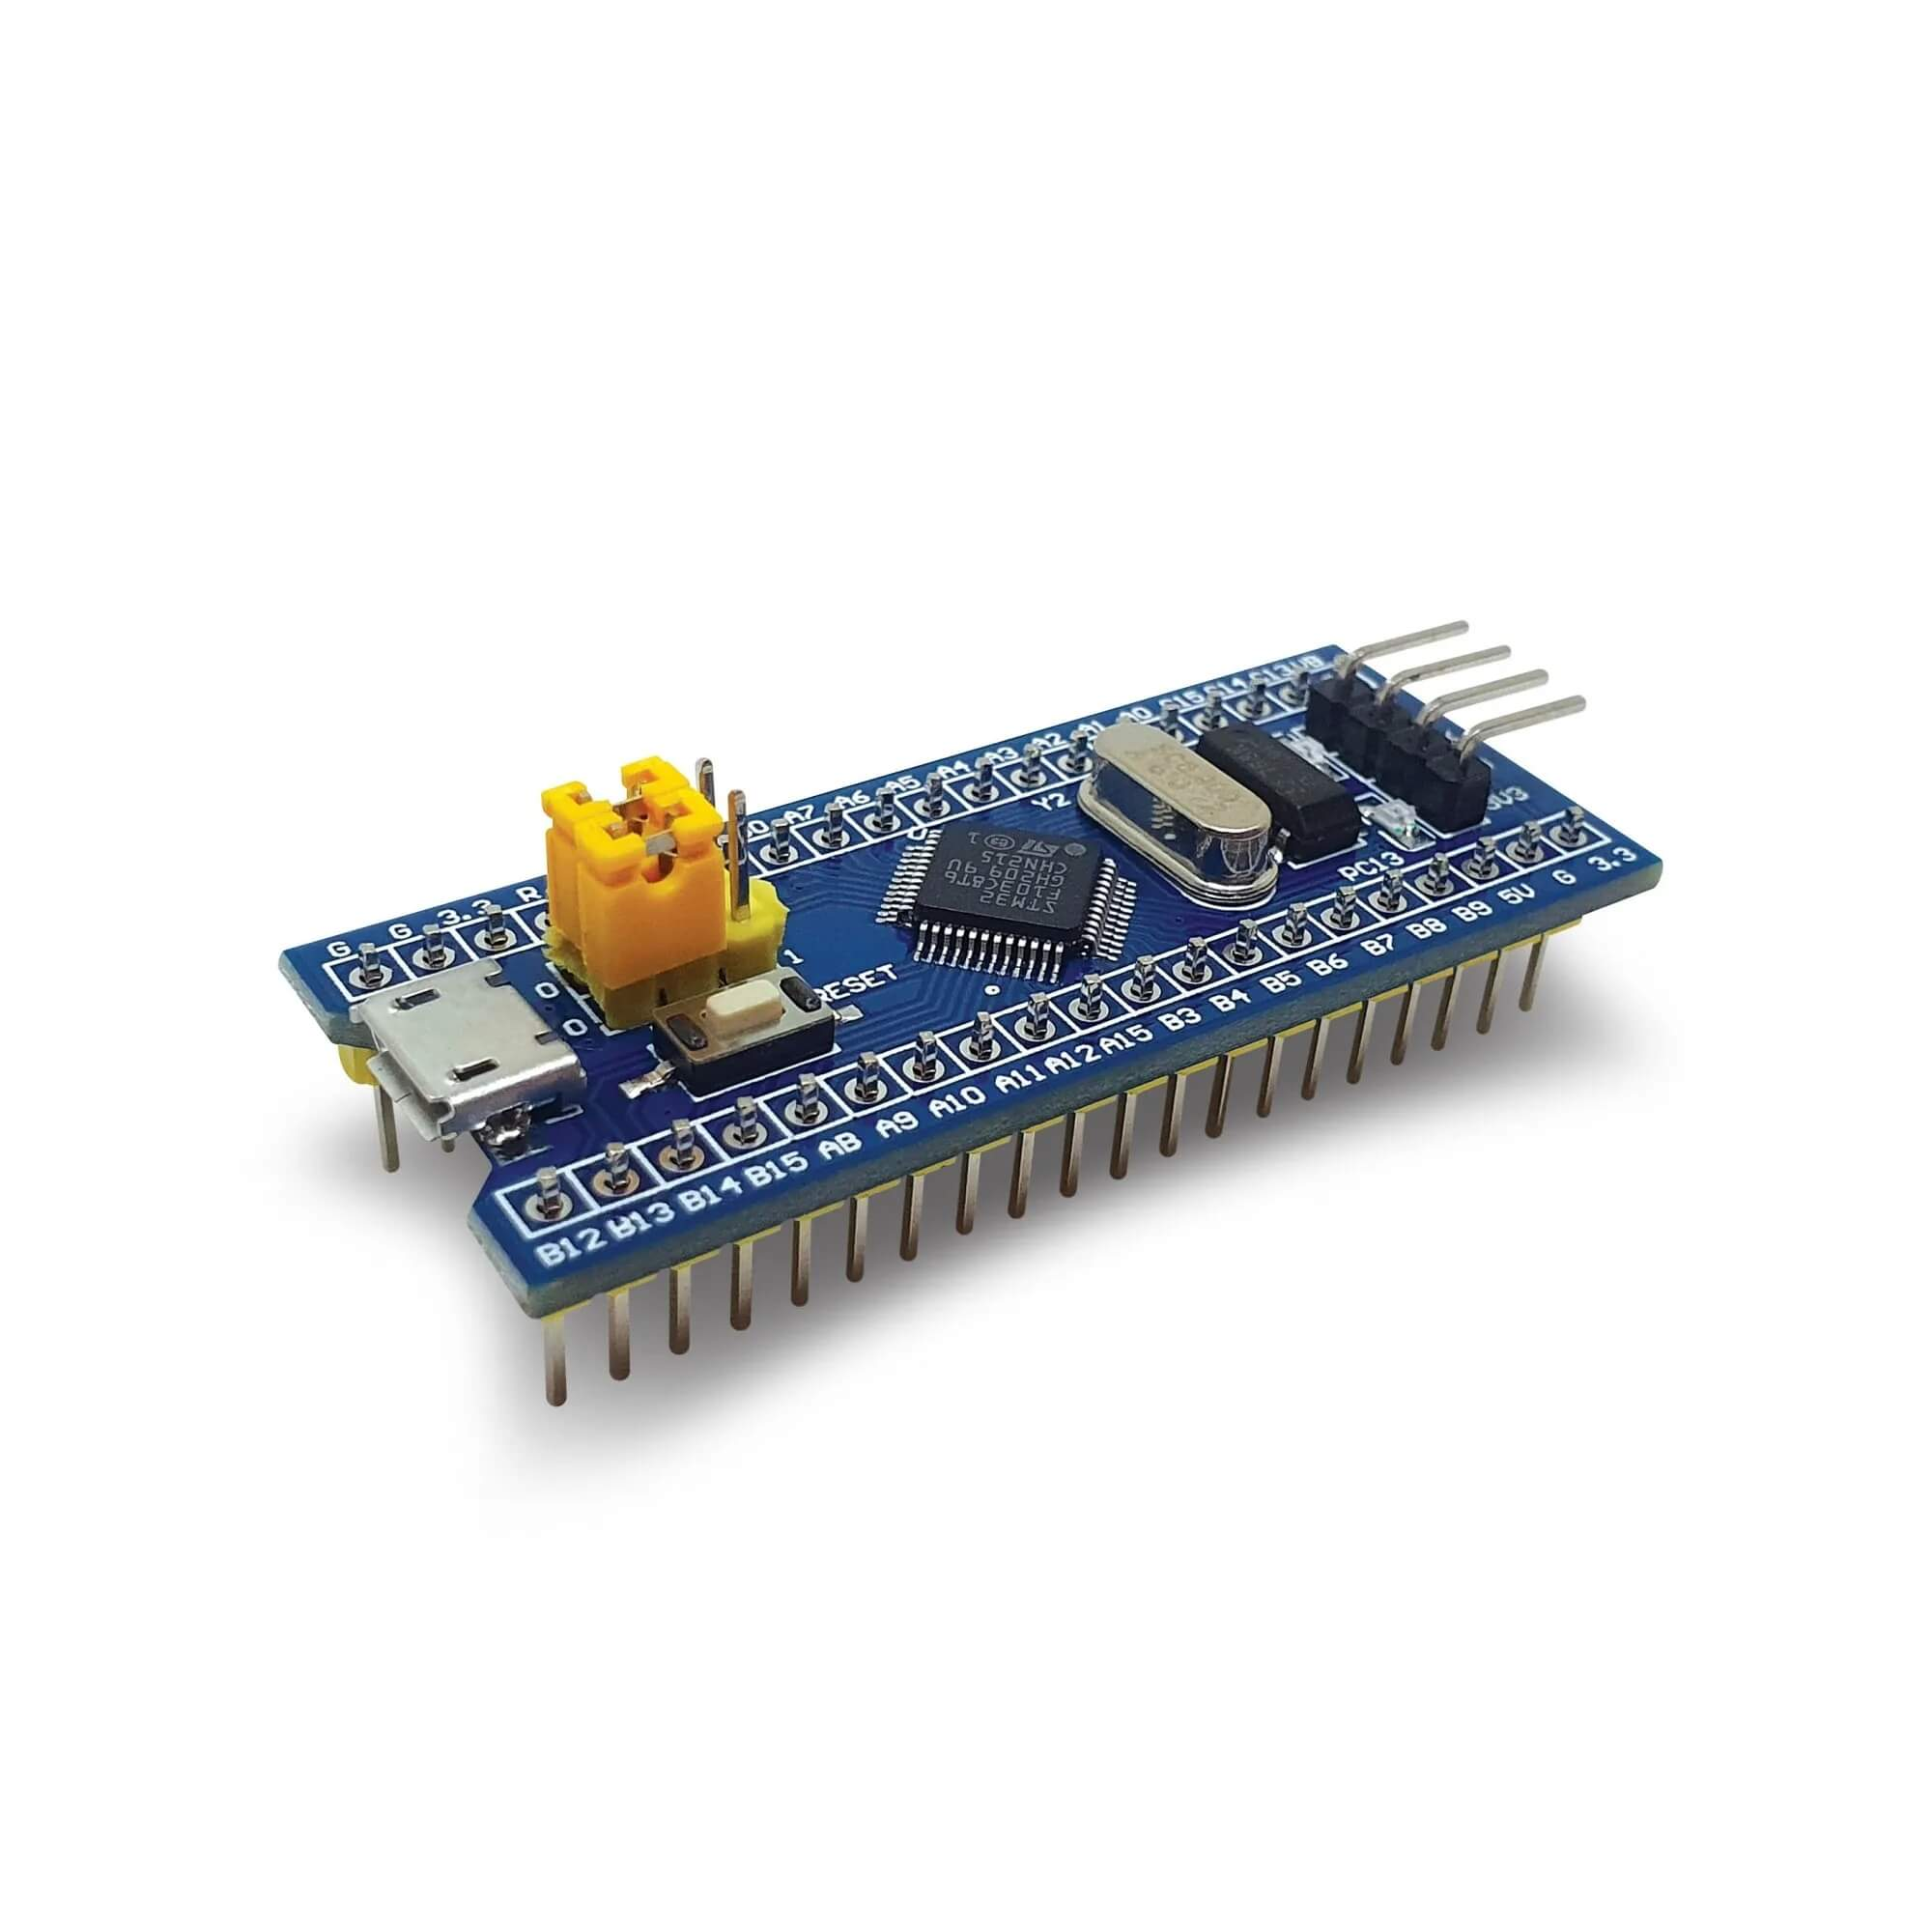 Placa STM32 F103C8T6 - Compatível